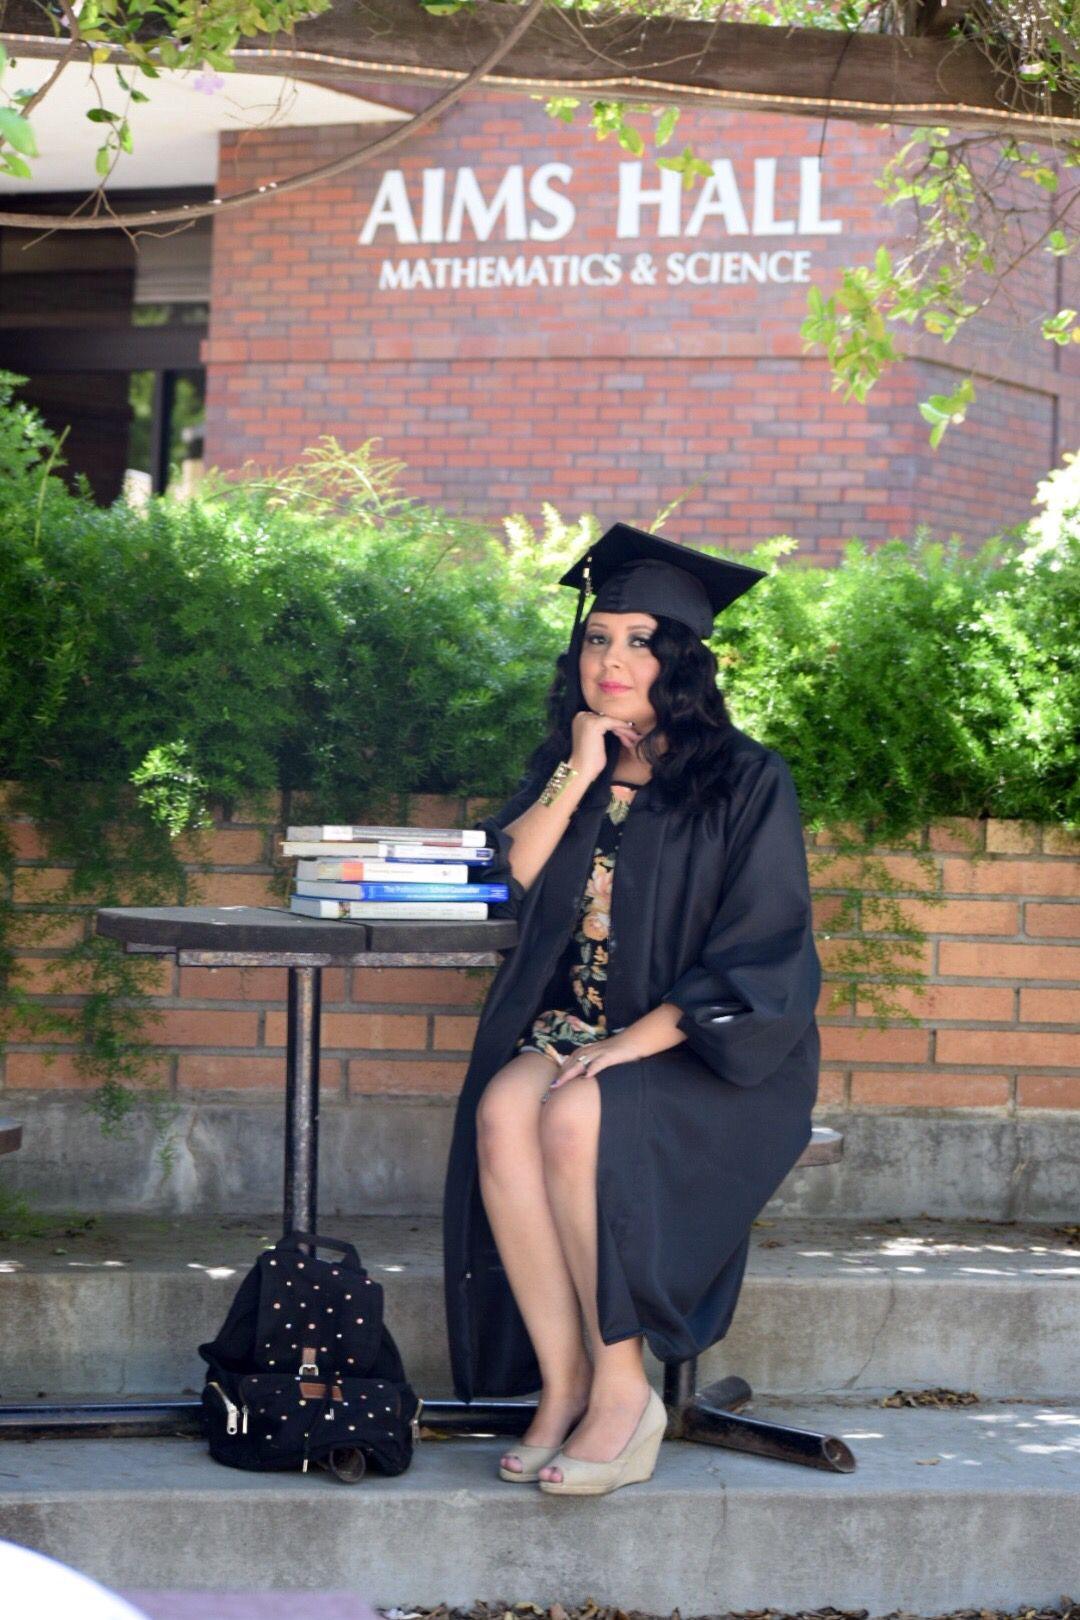 Graduation pictures graduation pictures mathematics